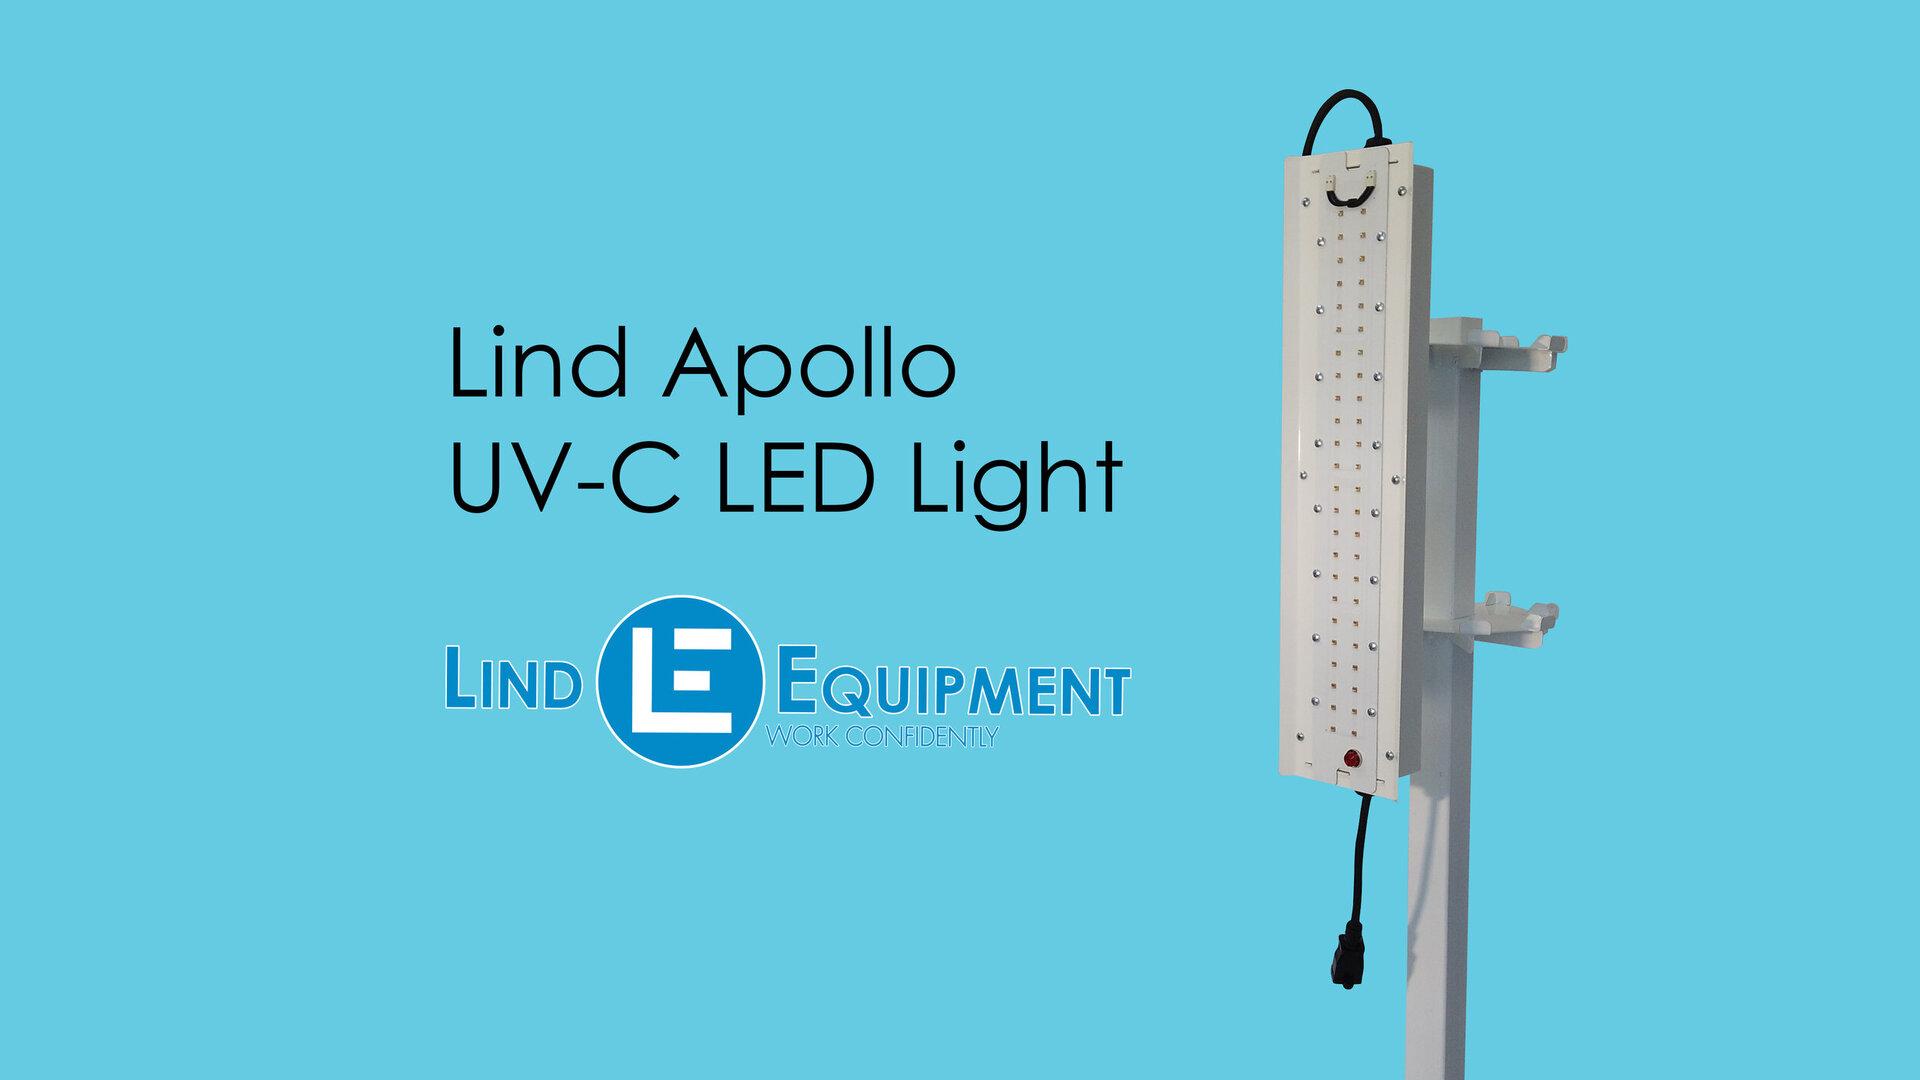 Apollo UVC LED system